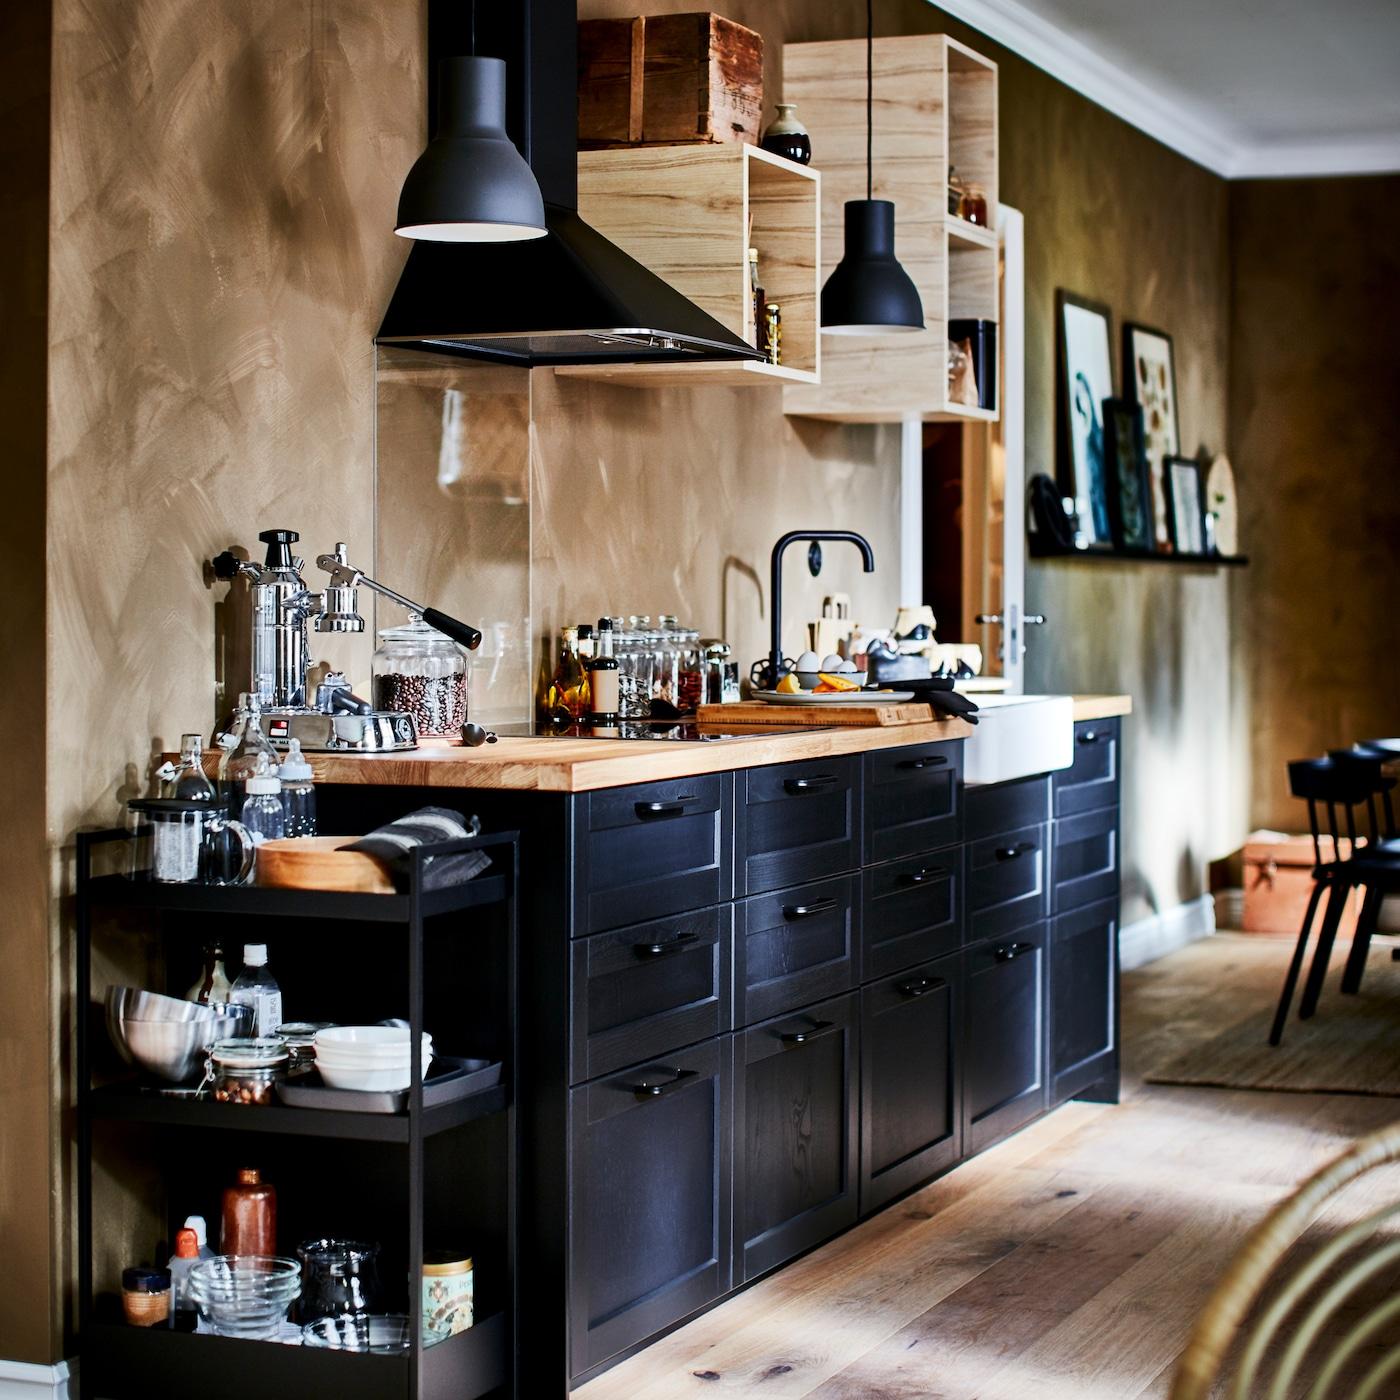 Affordable kitchen updates - IKEA